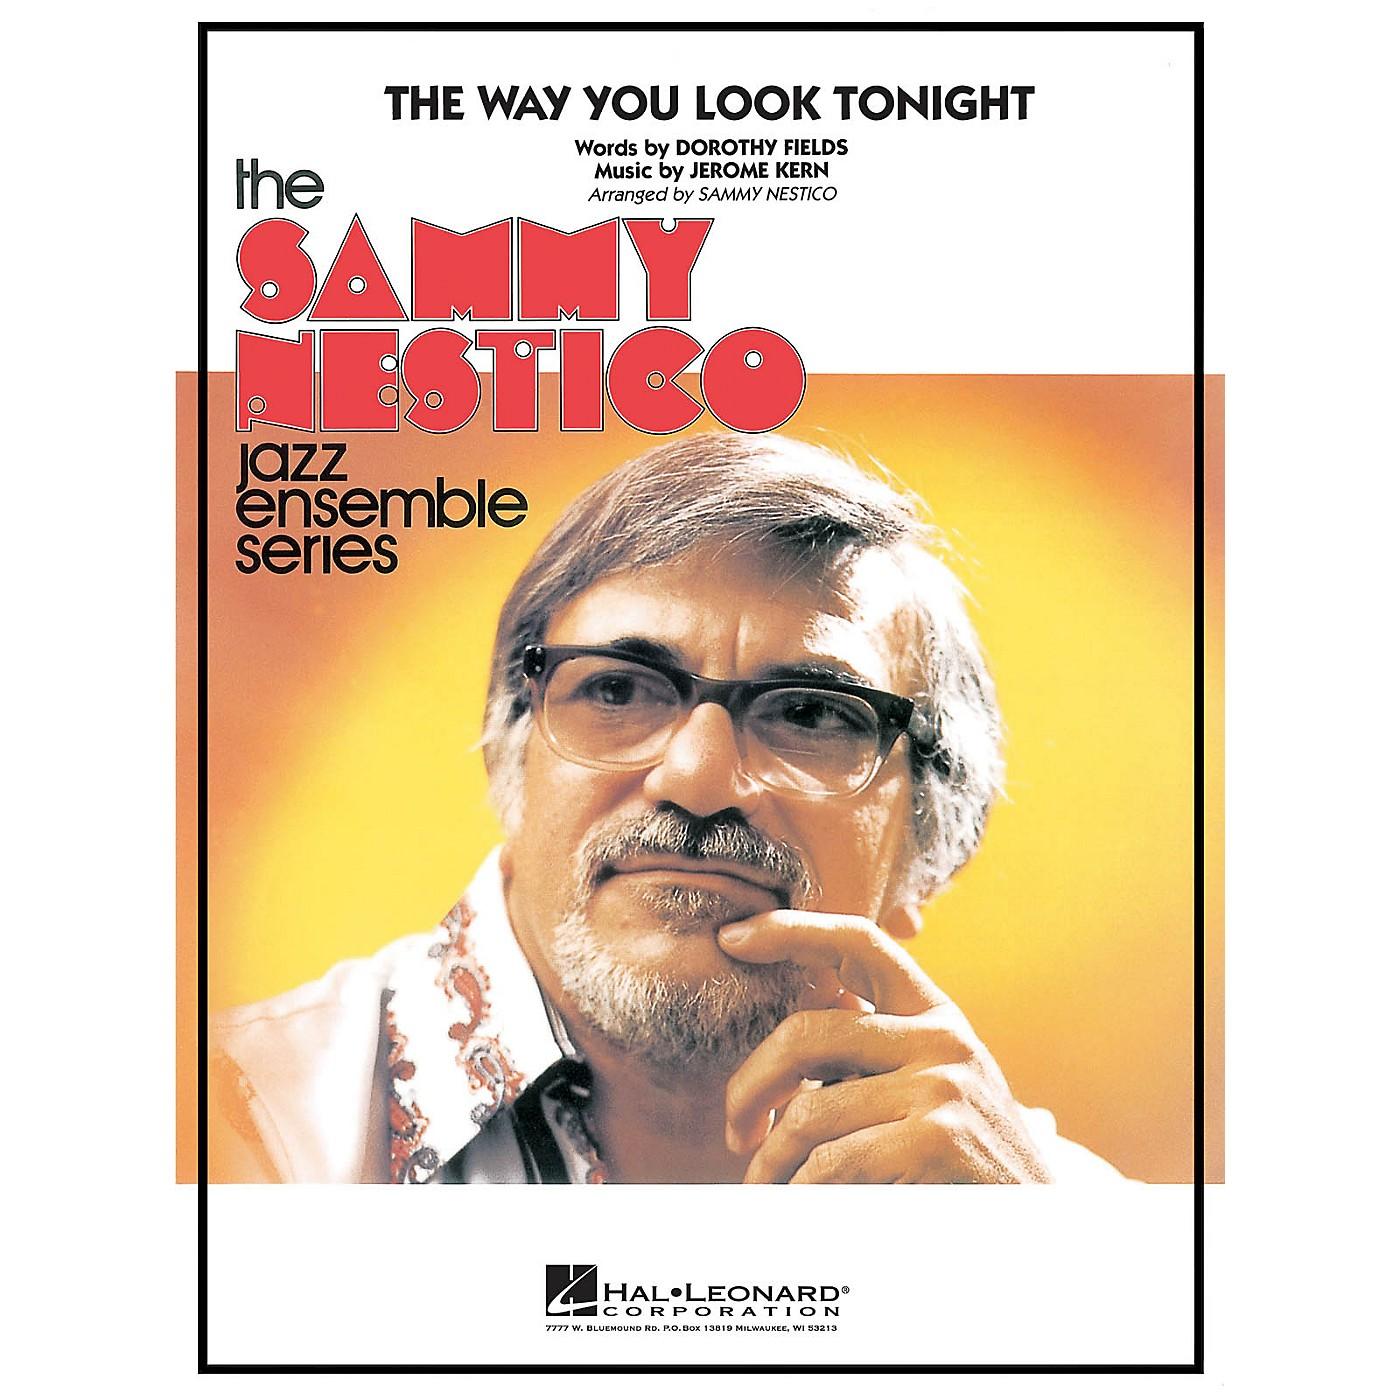 Hal Leonard The Way You Look Tonight Jazz Band Level 4 Arranged by Sammy Nestico thumbnail